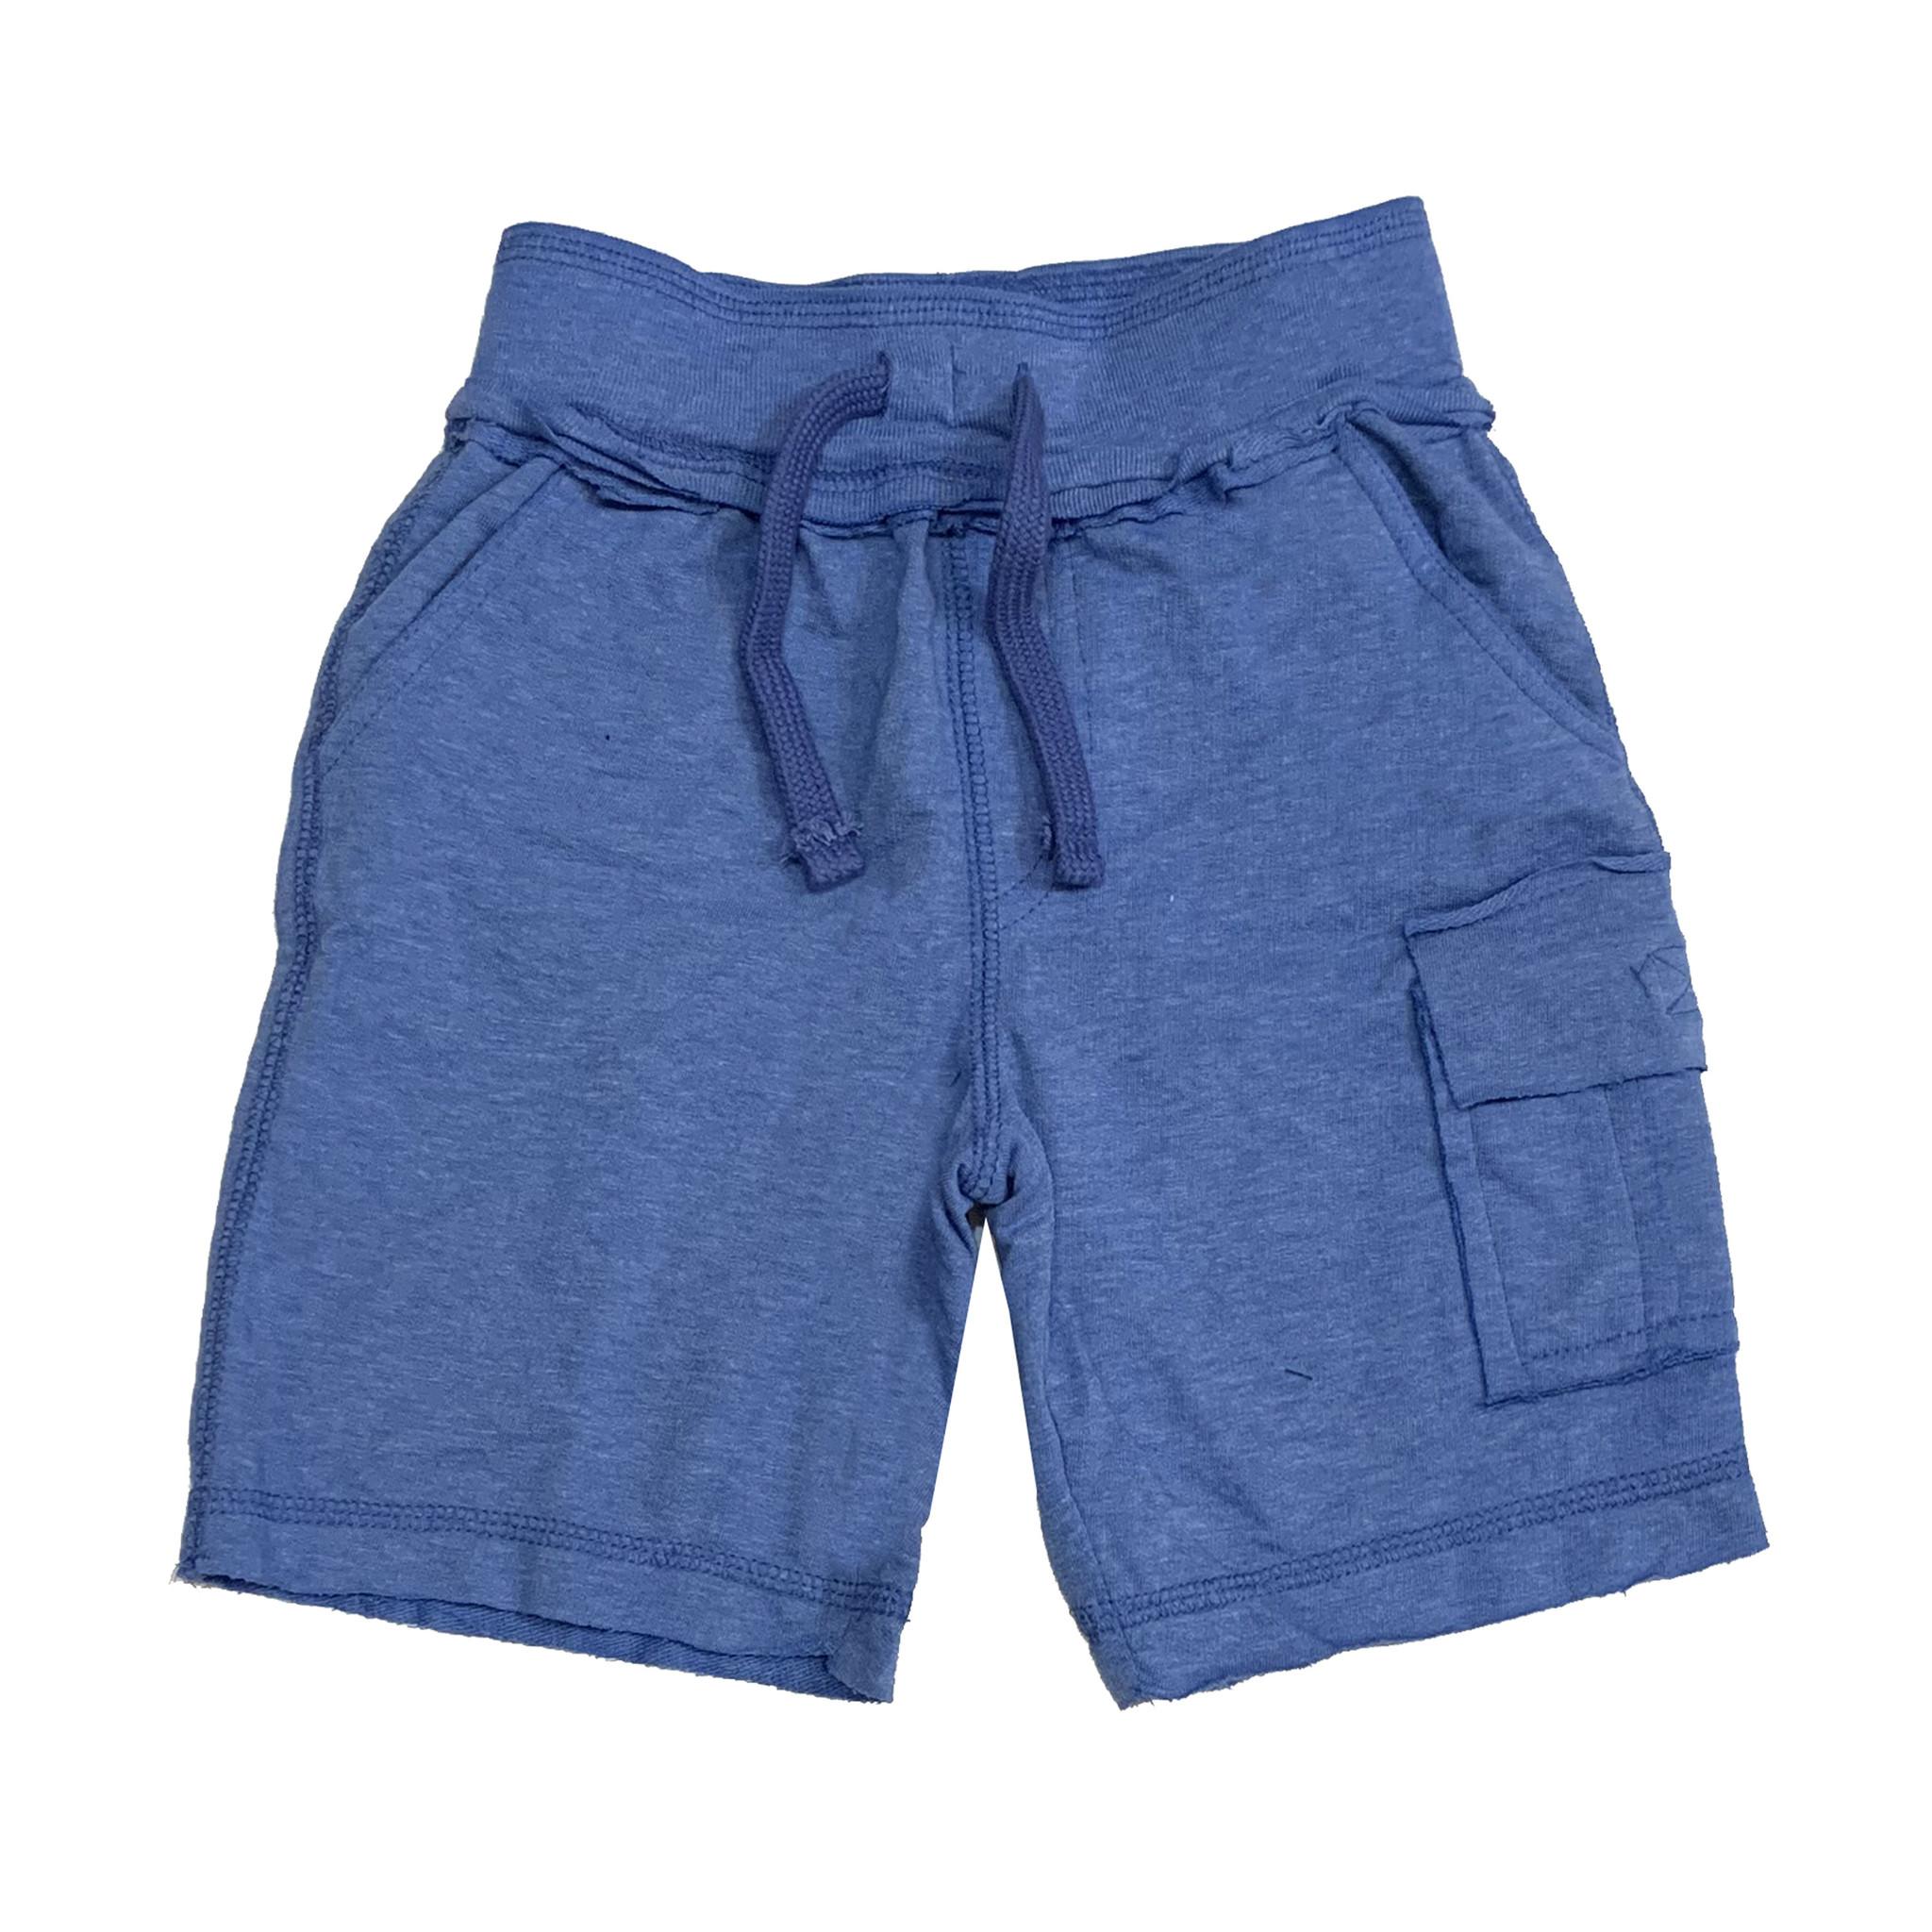 Mish Distressed Cobalt Infant Cargo Shorts